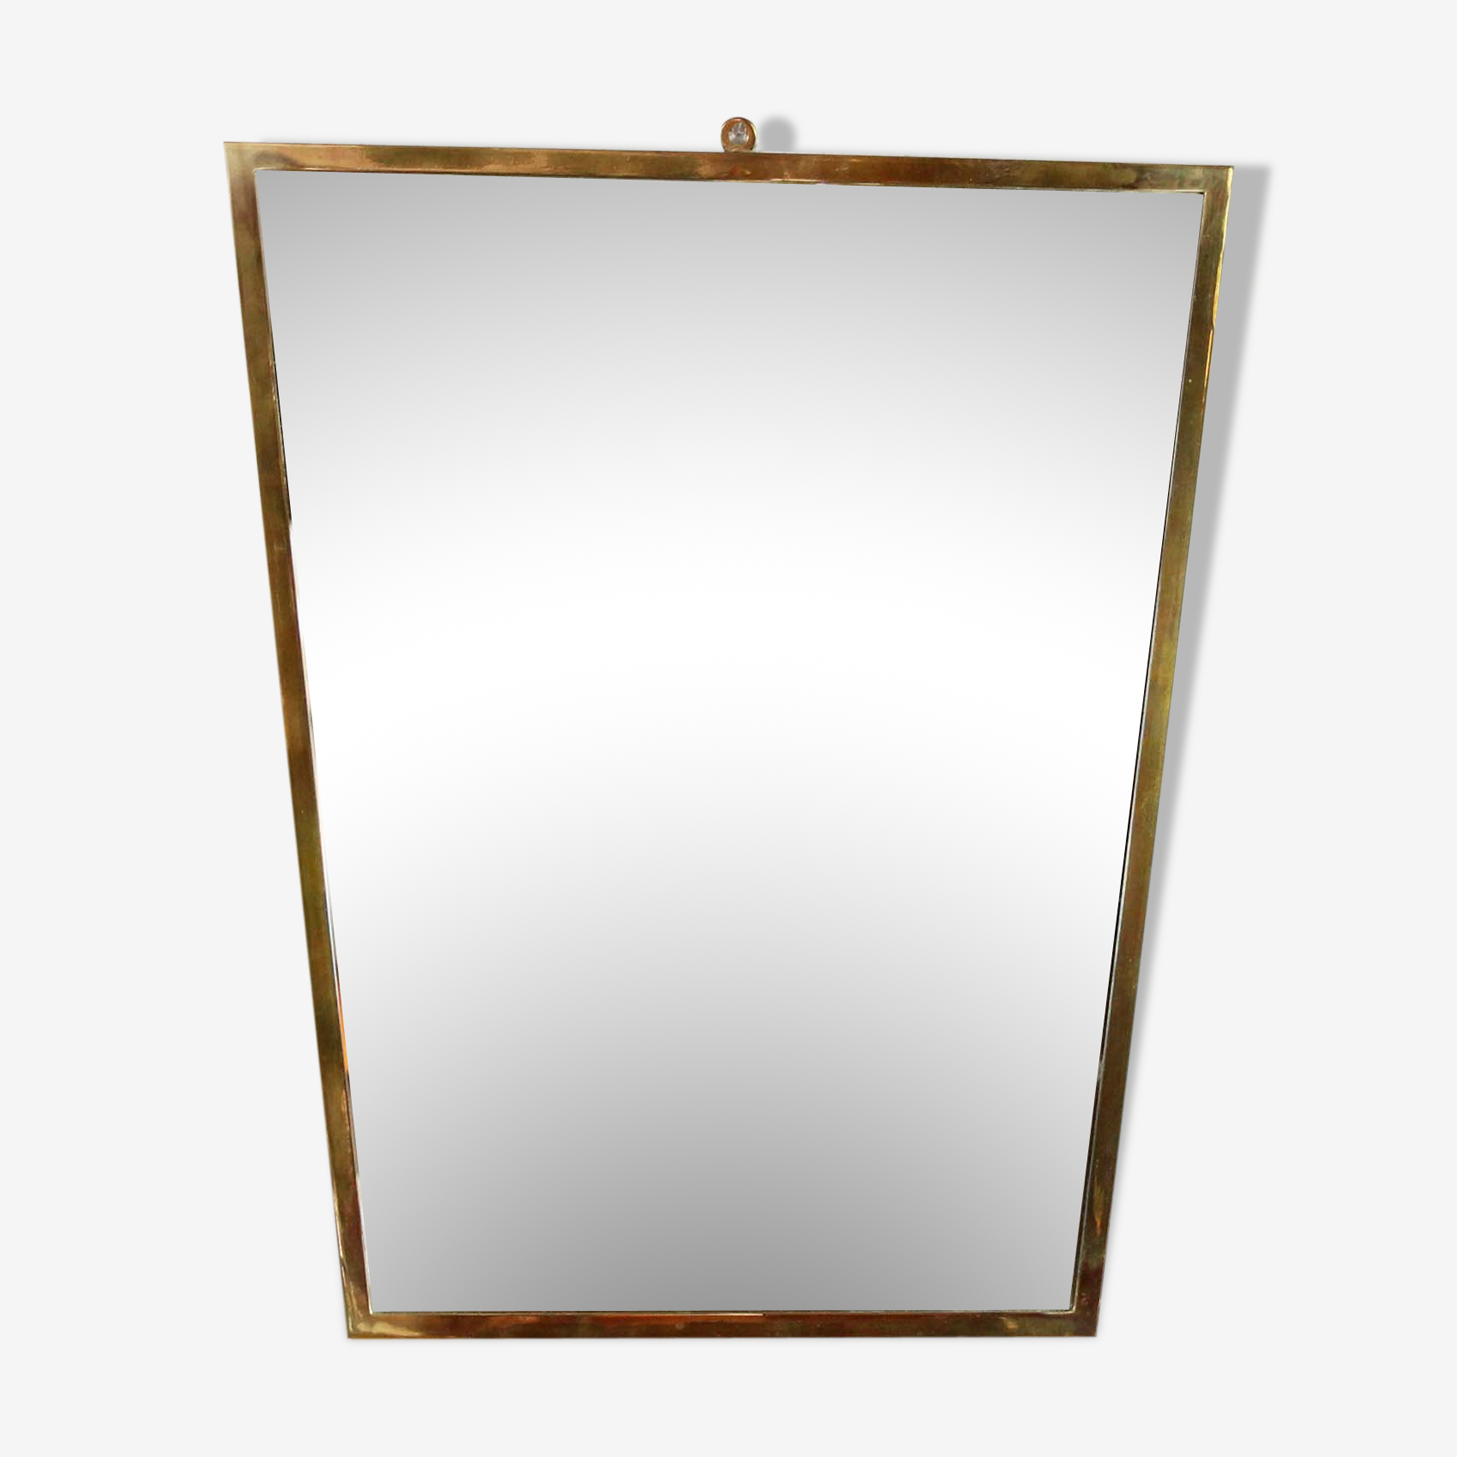 Mirror retroviseaur asymmetrical brass 42x36cm